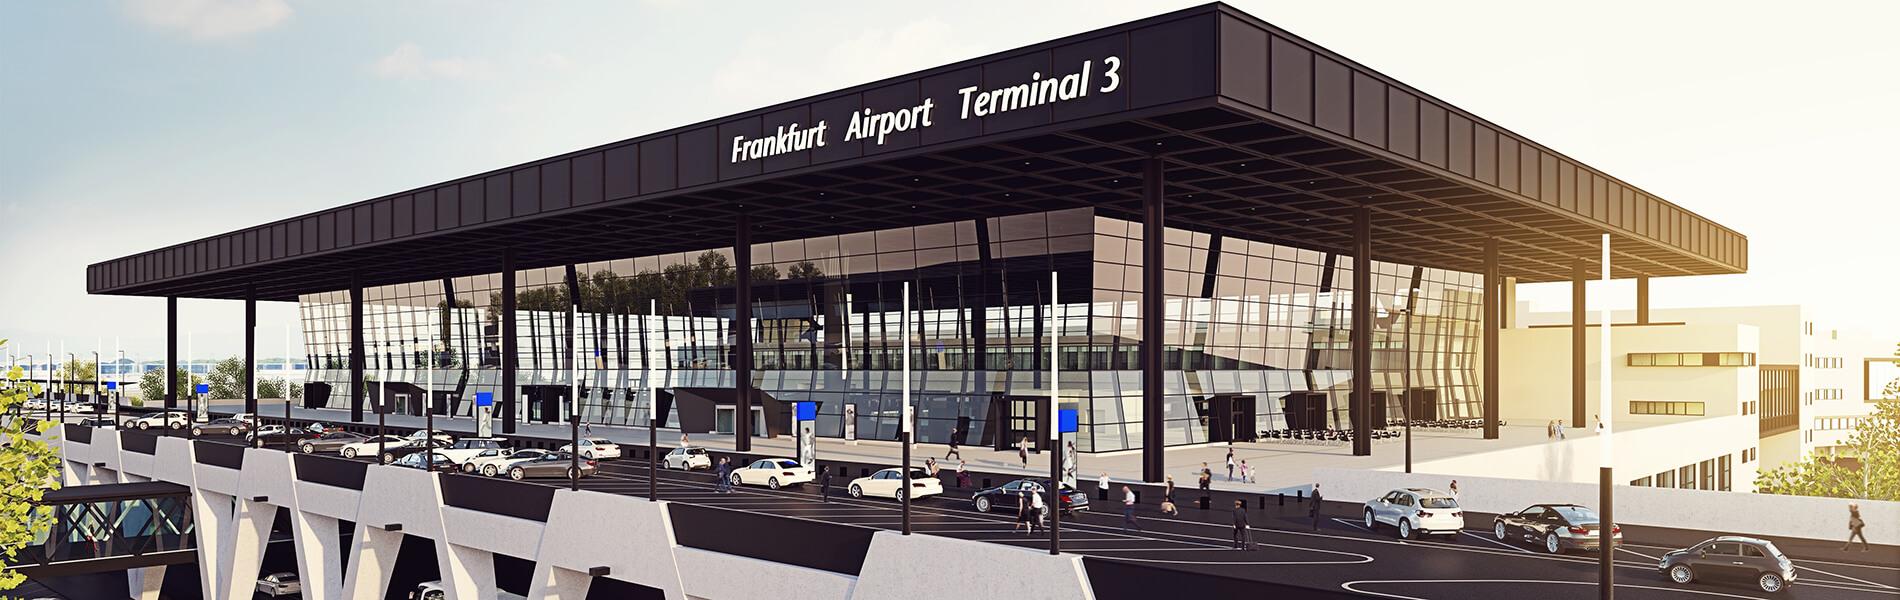 Aktuelle Infrastrukturprojekte: Flughafen Frankfurt: Fraport baut Terminal 3